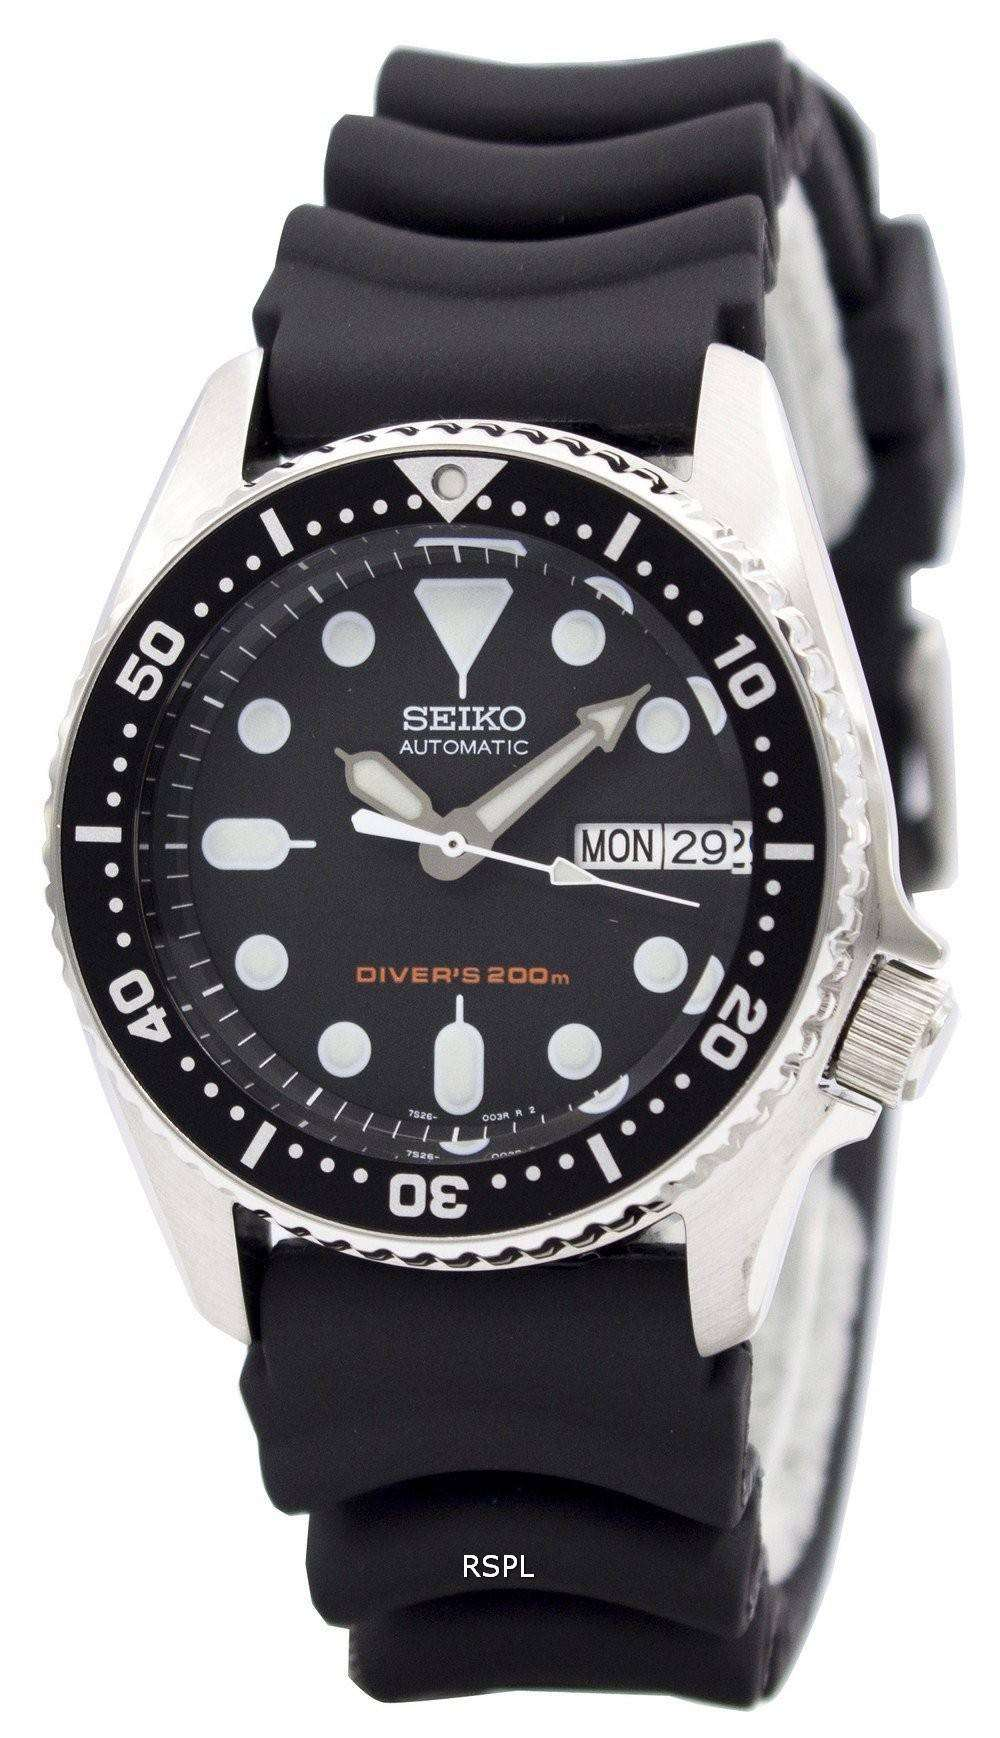 Seiko Mid Size Divers 200m Automatic Watch Skx013k1